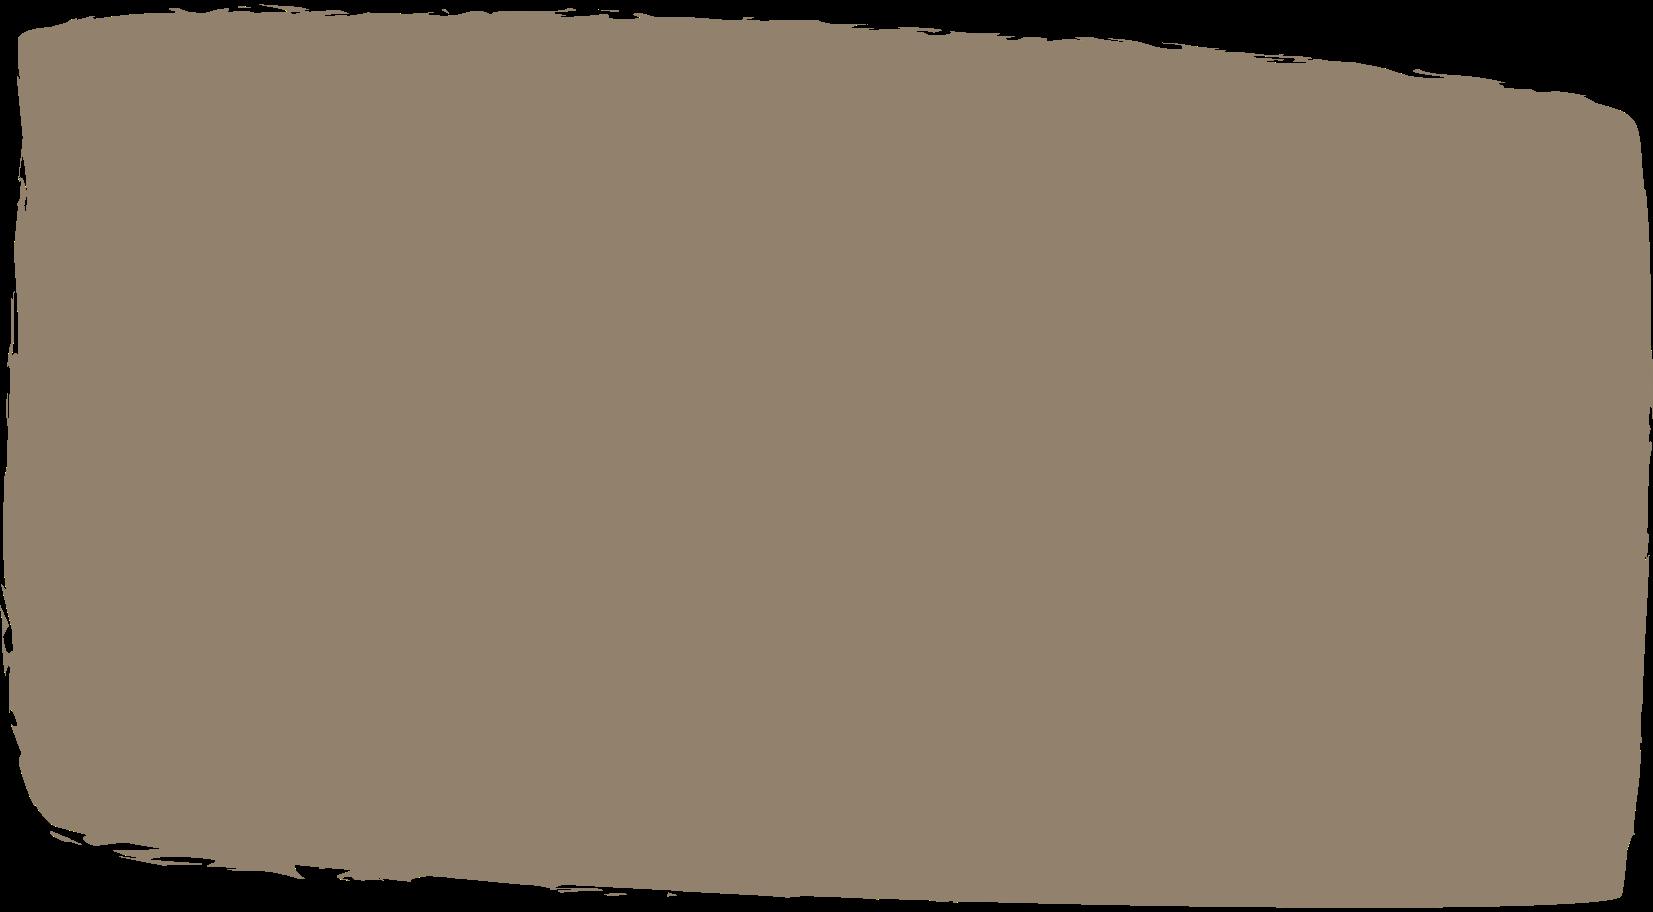 rectangle-dark-grey Clipart illustration in PNG, SVG